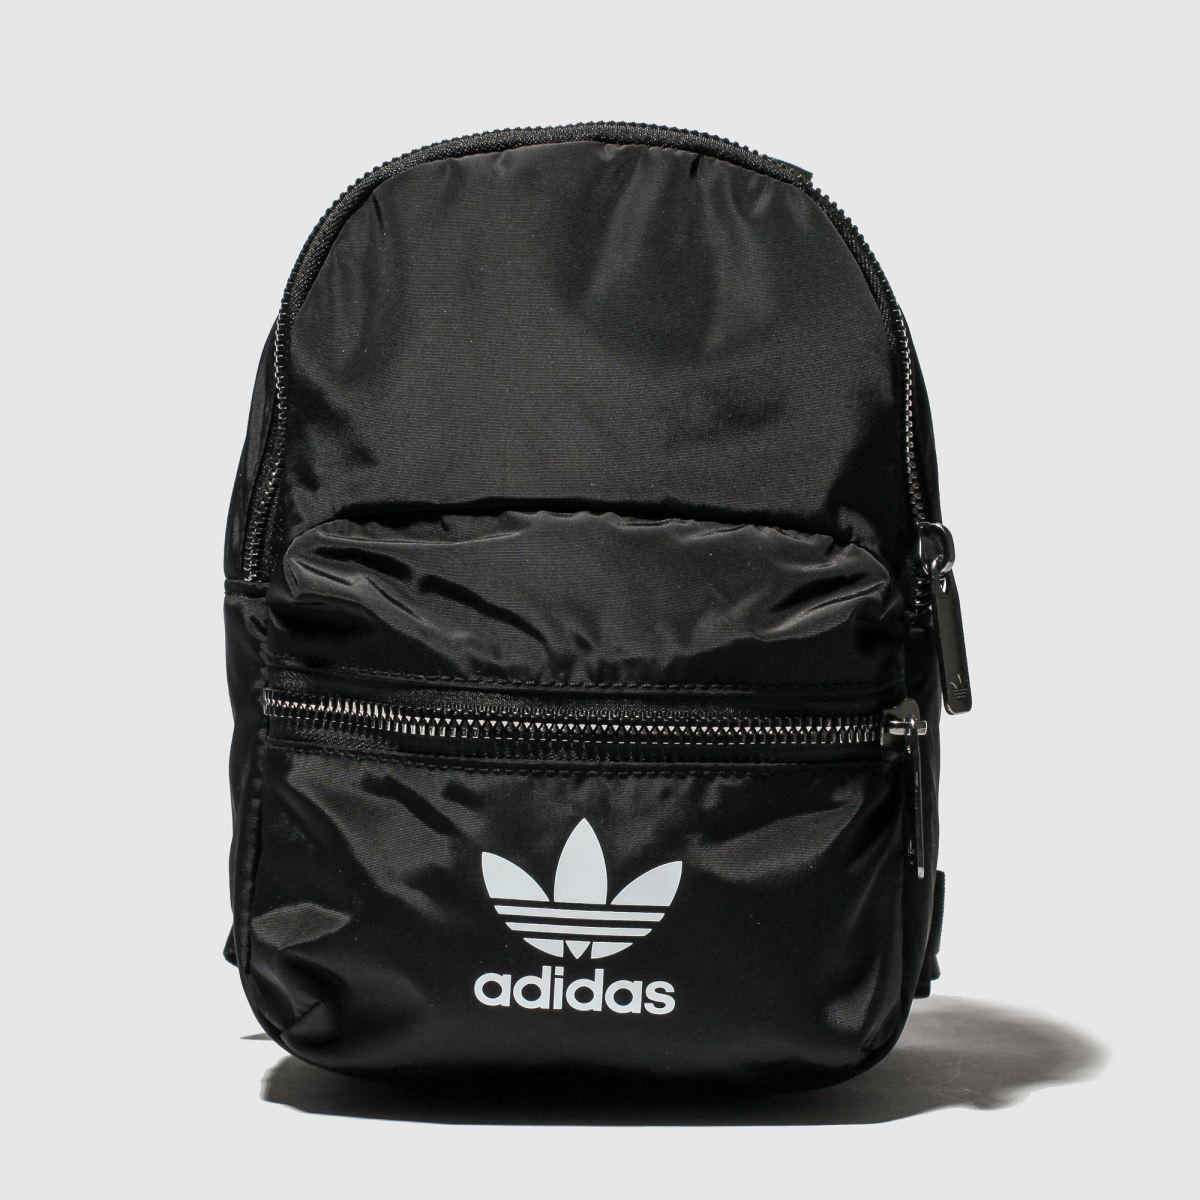 Image of Adidas Black & White Mini